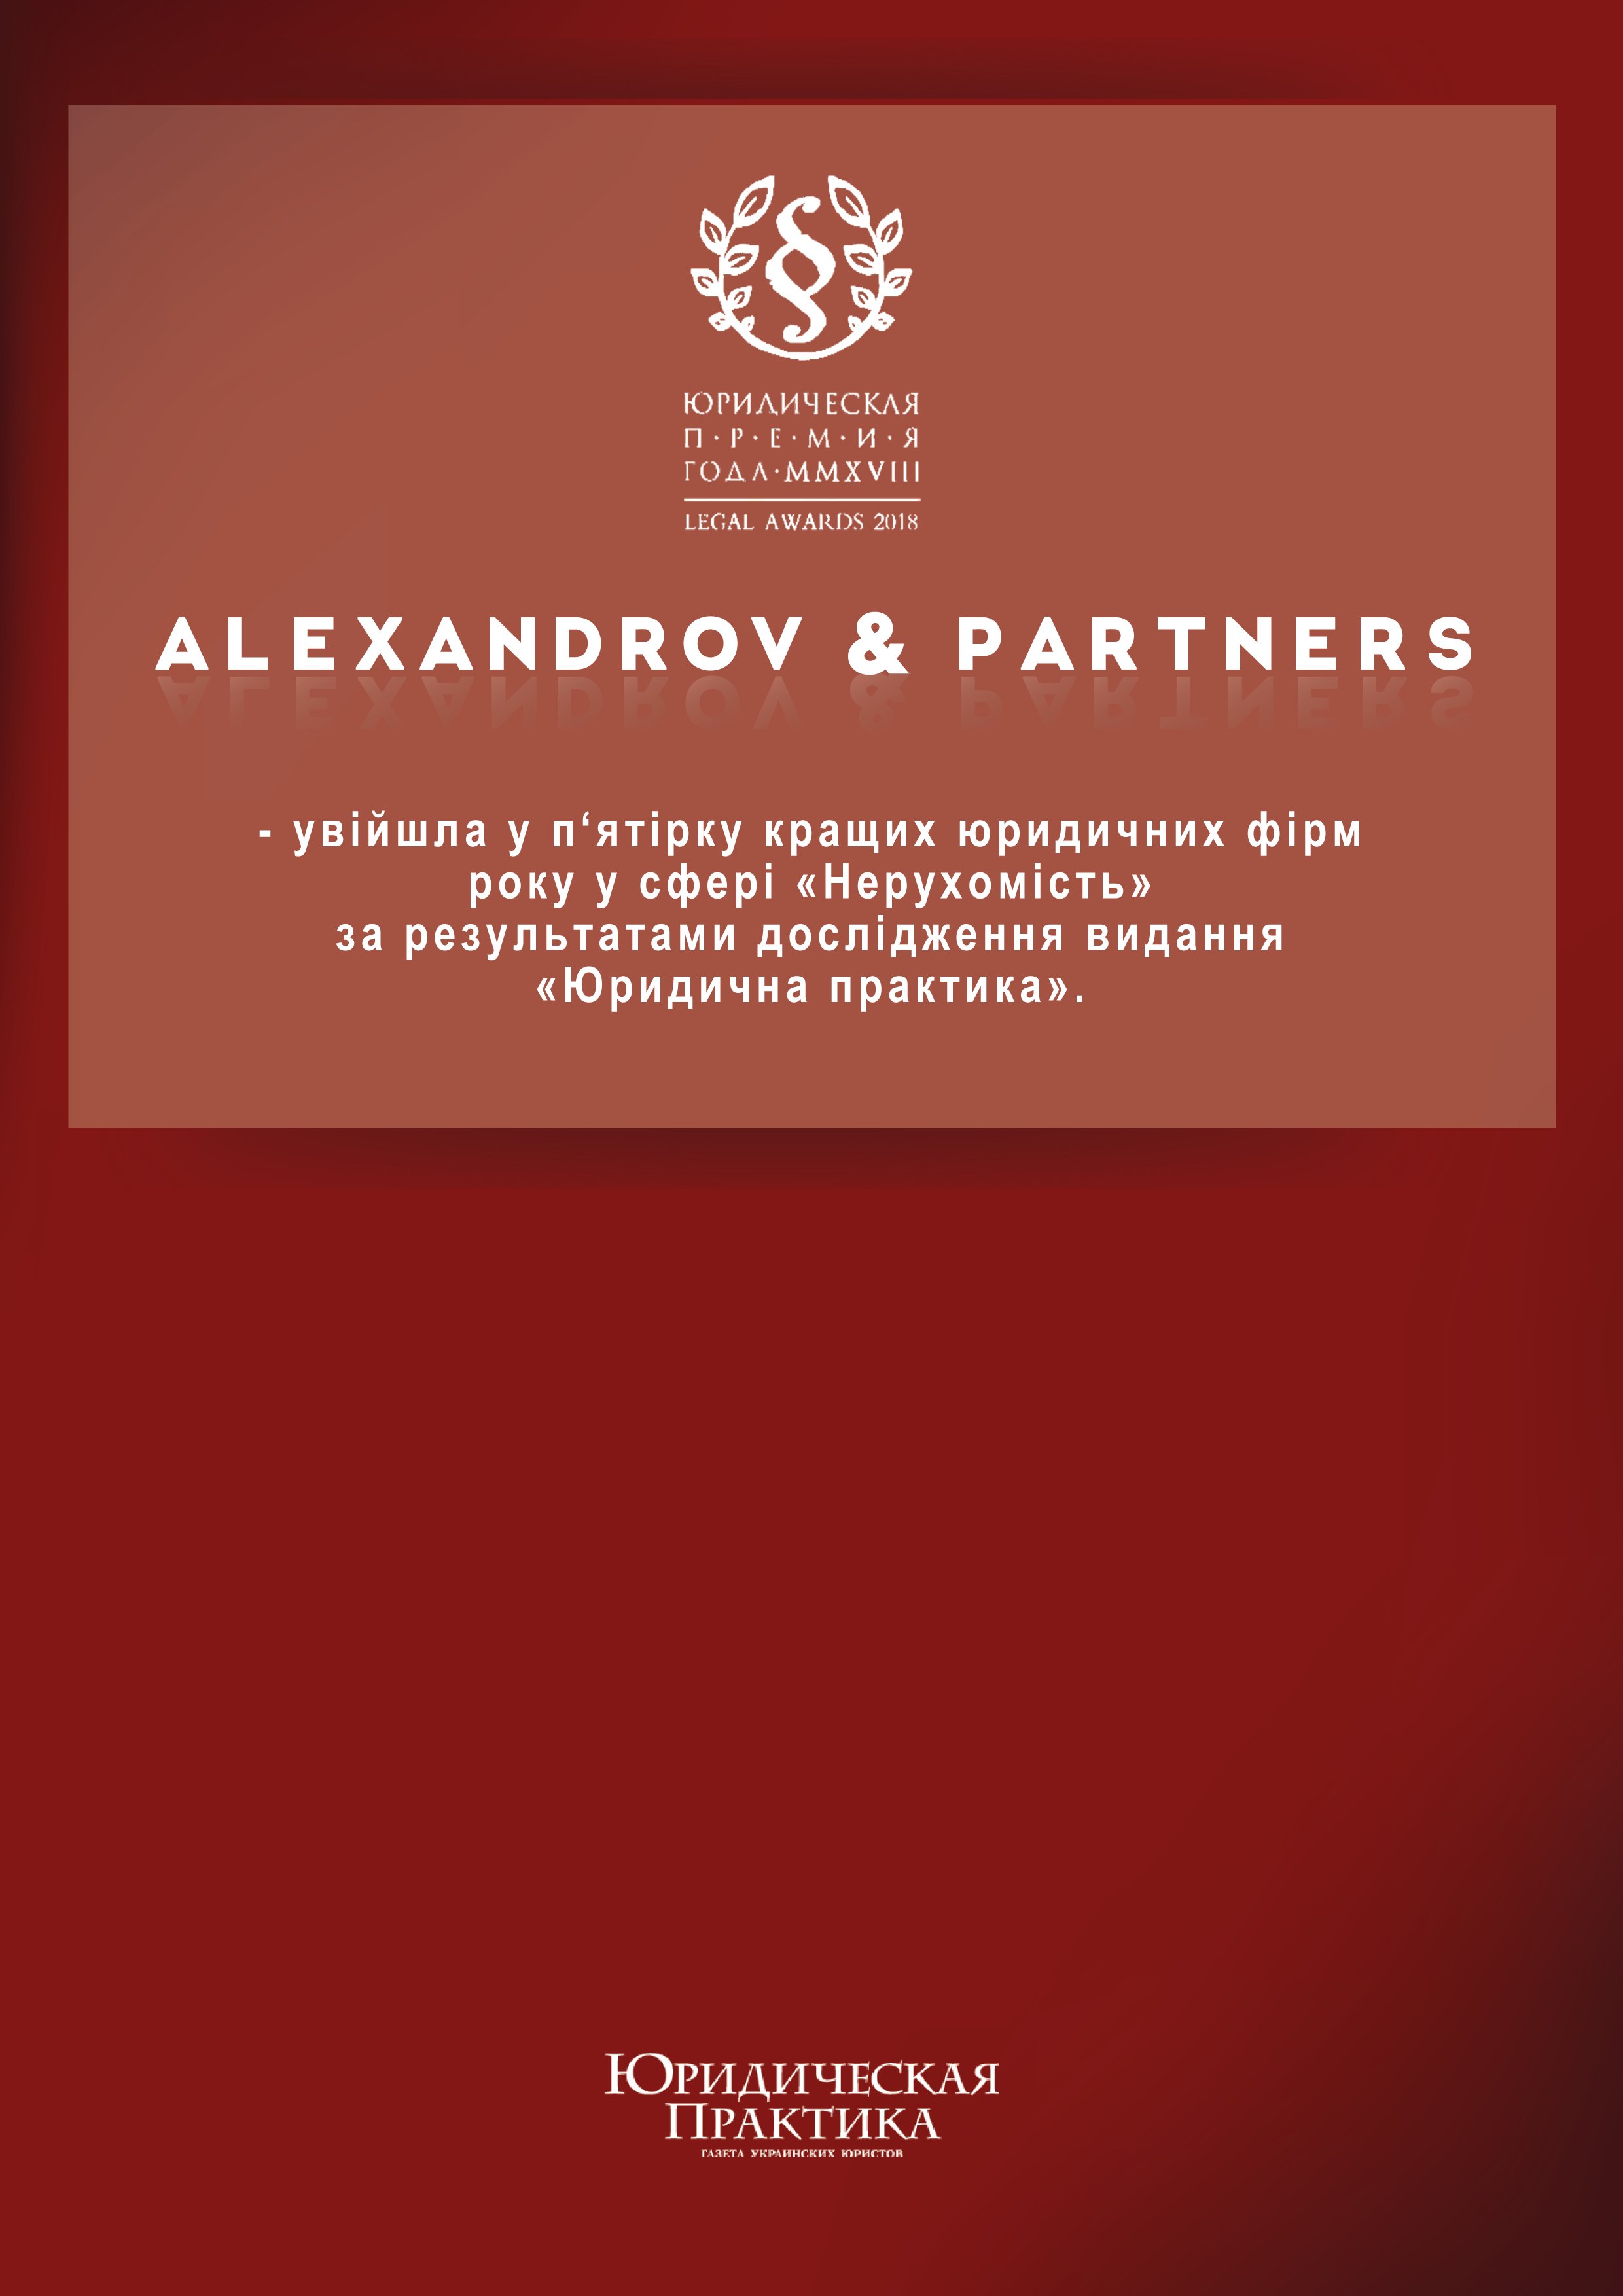 Awards - ALEXANDROV&PARTNERS